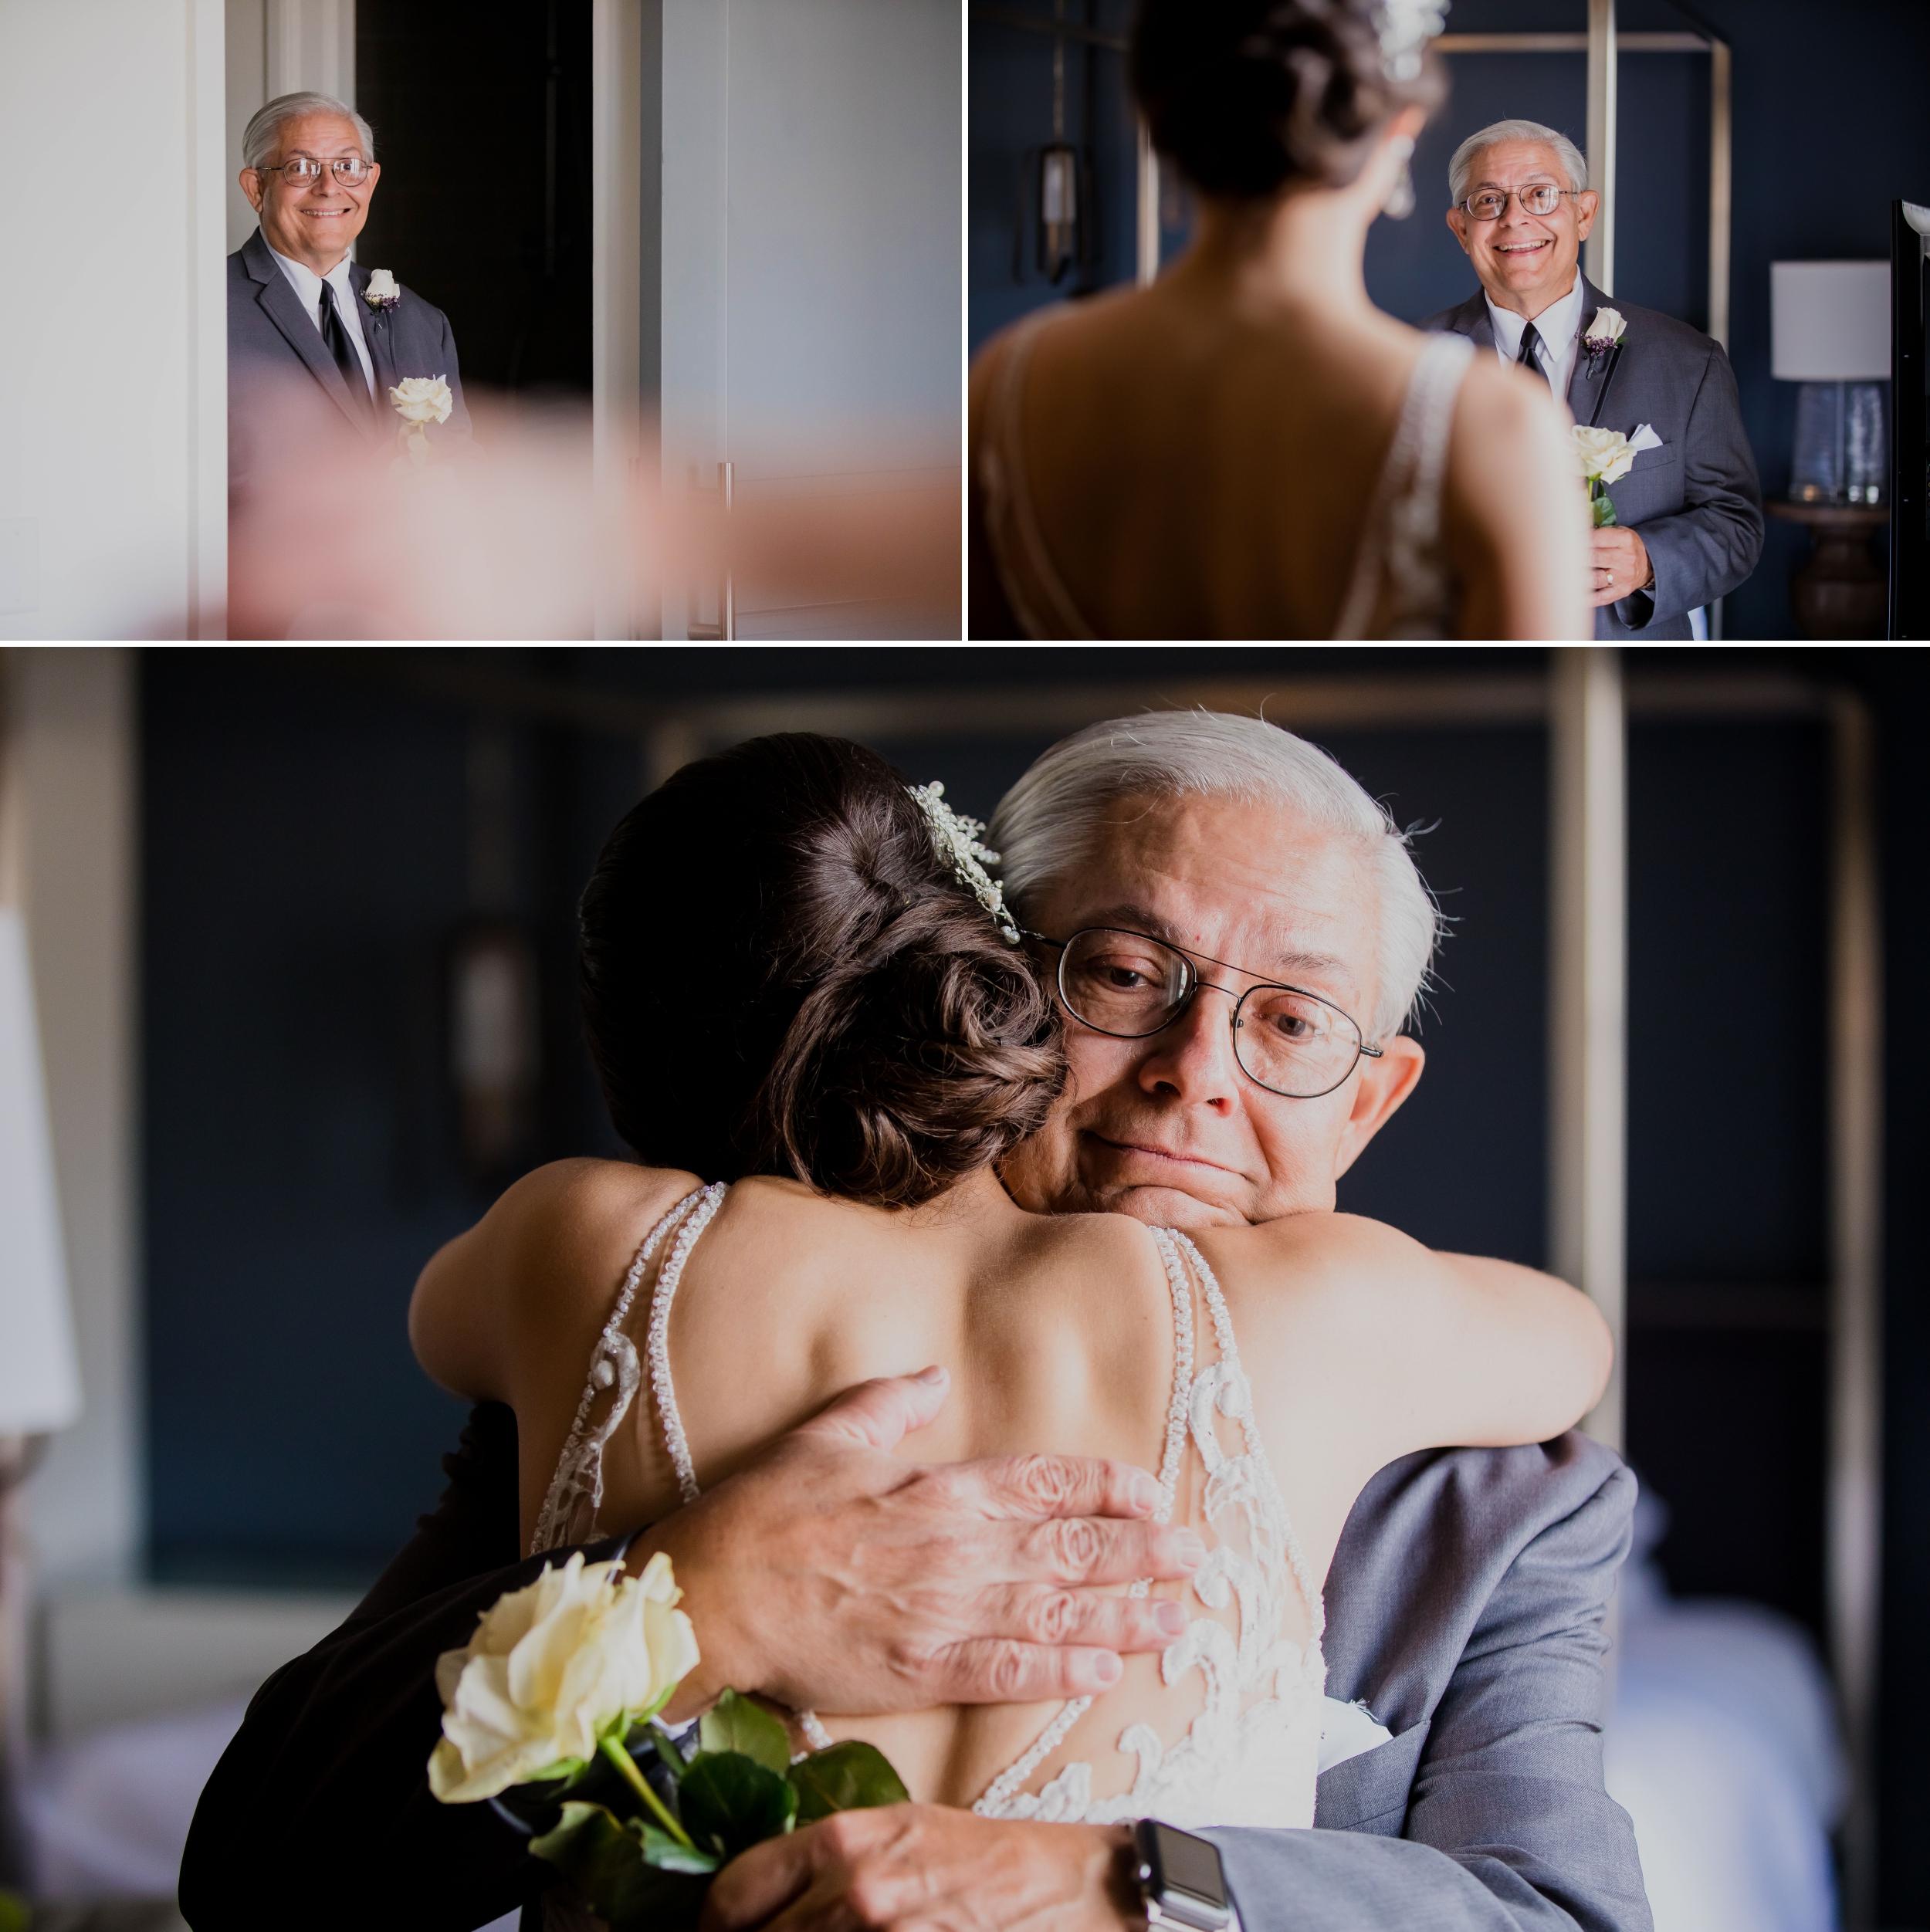 Wedding Hotel Colonnade Coral Gables - Santy Martinez 11.jpg